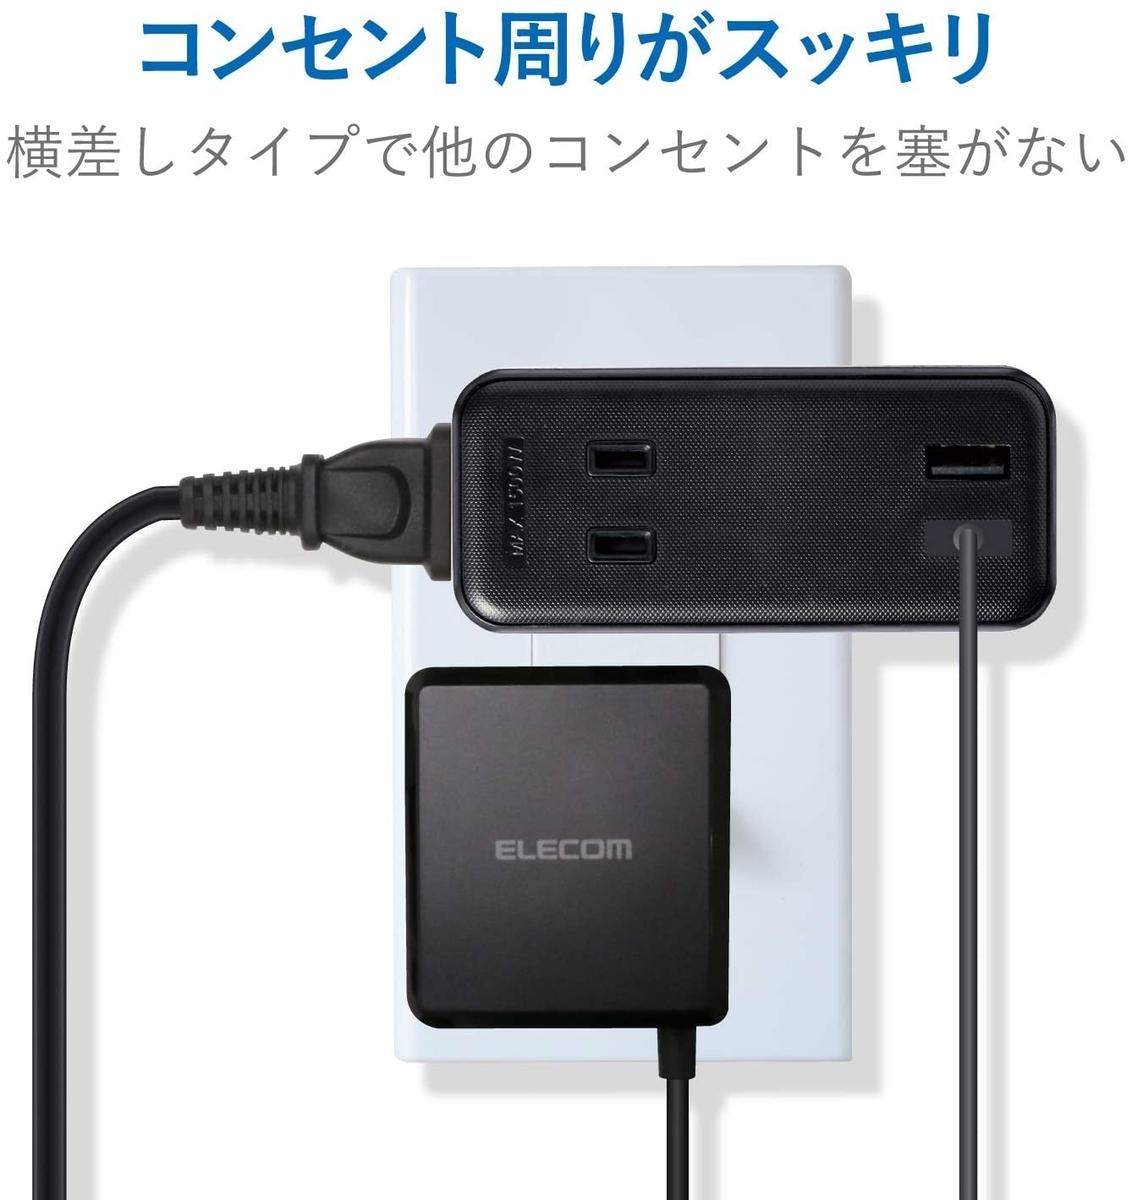 f:id:tsukasamochi:20201118025543j:plain